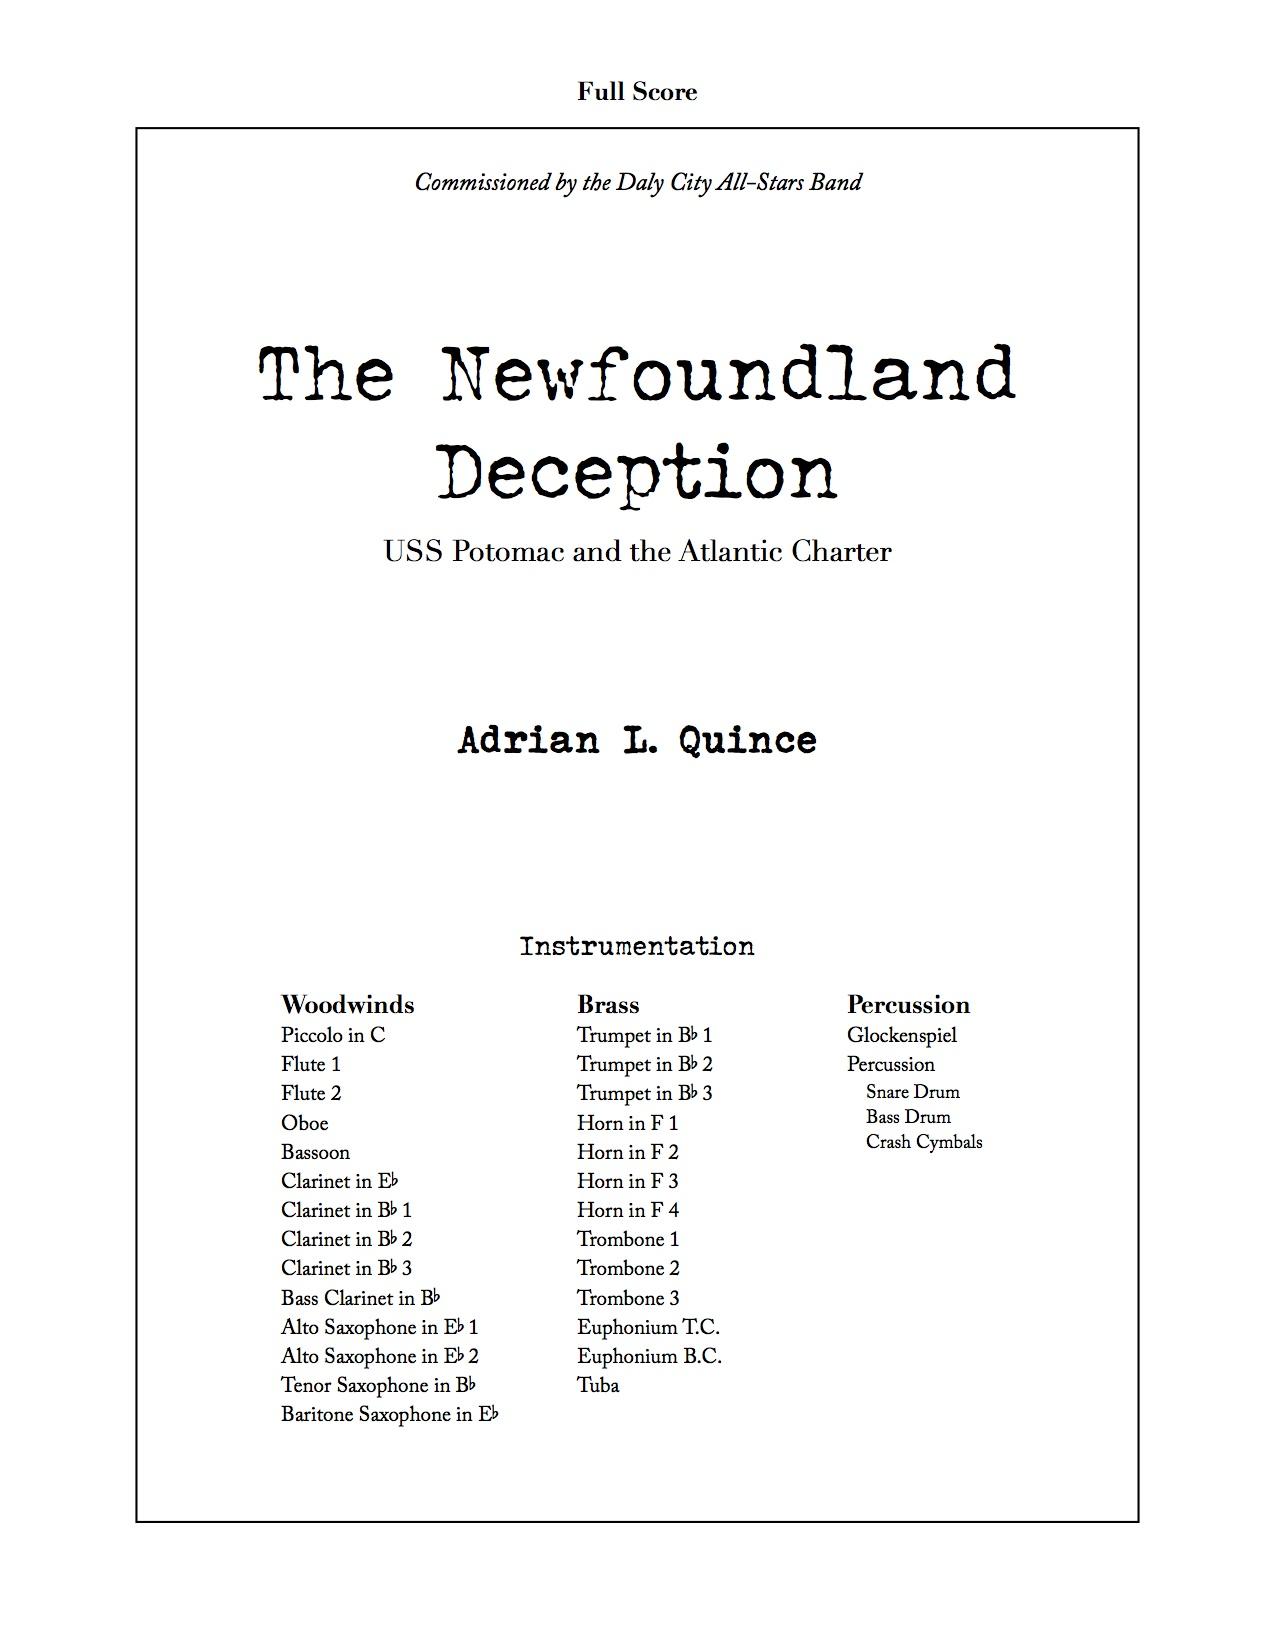 The Newfoundland Deception 1.jpg